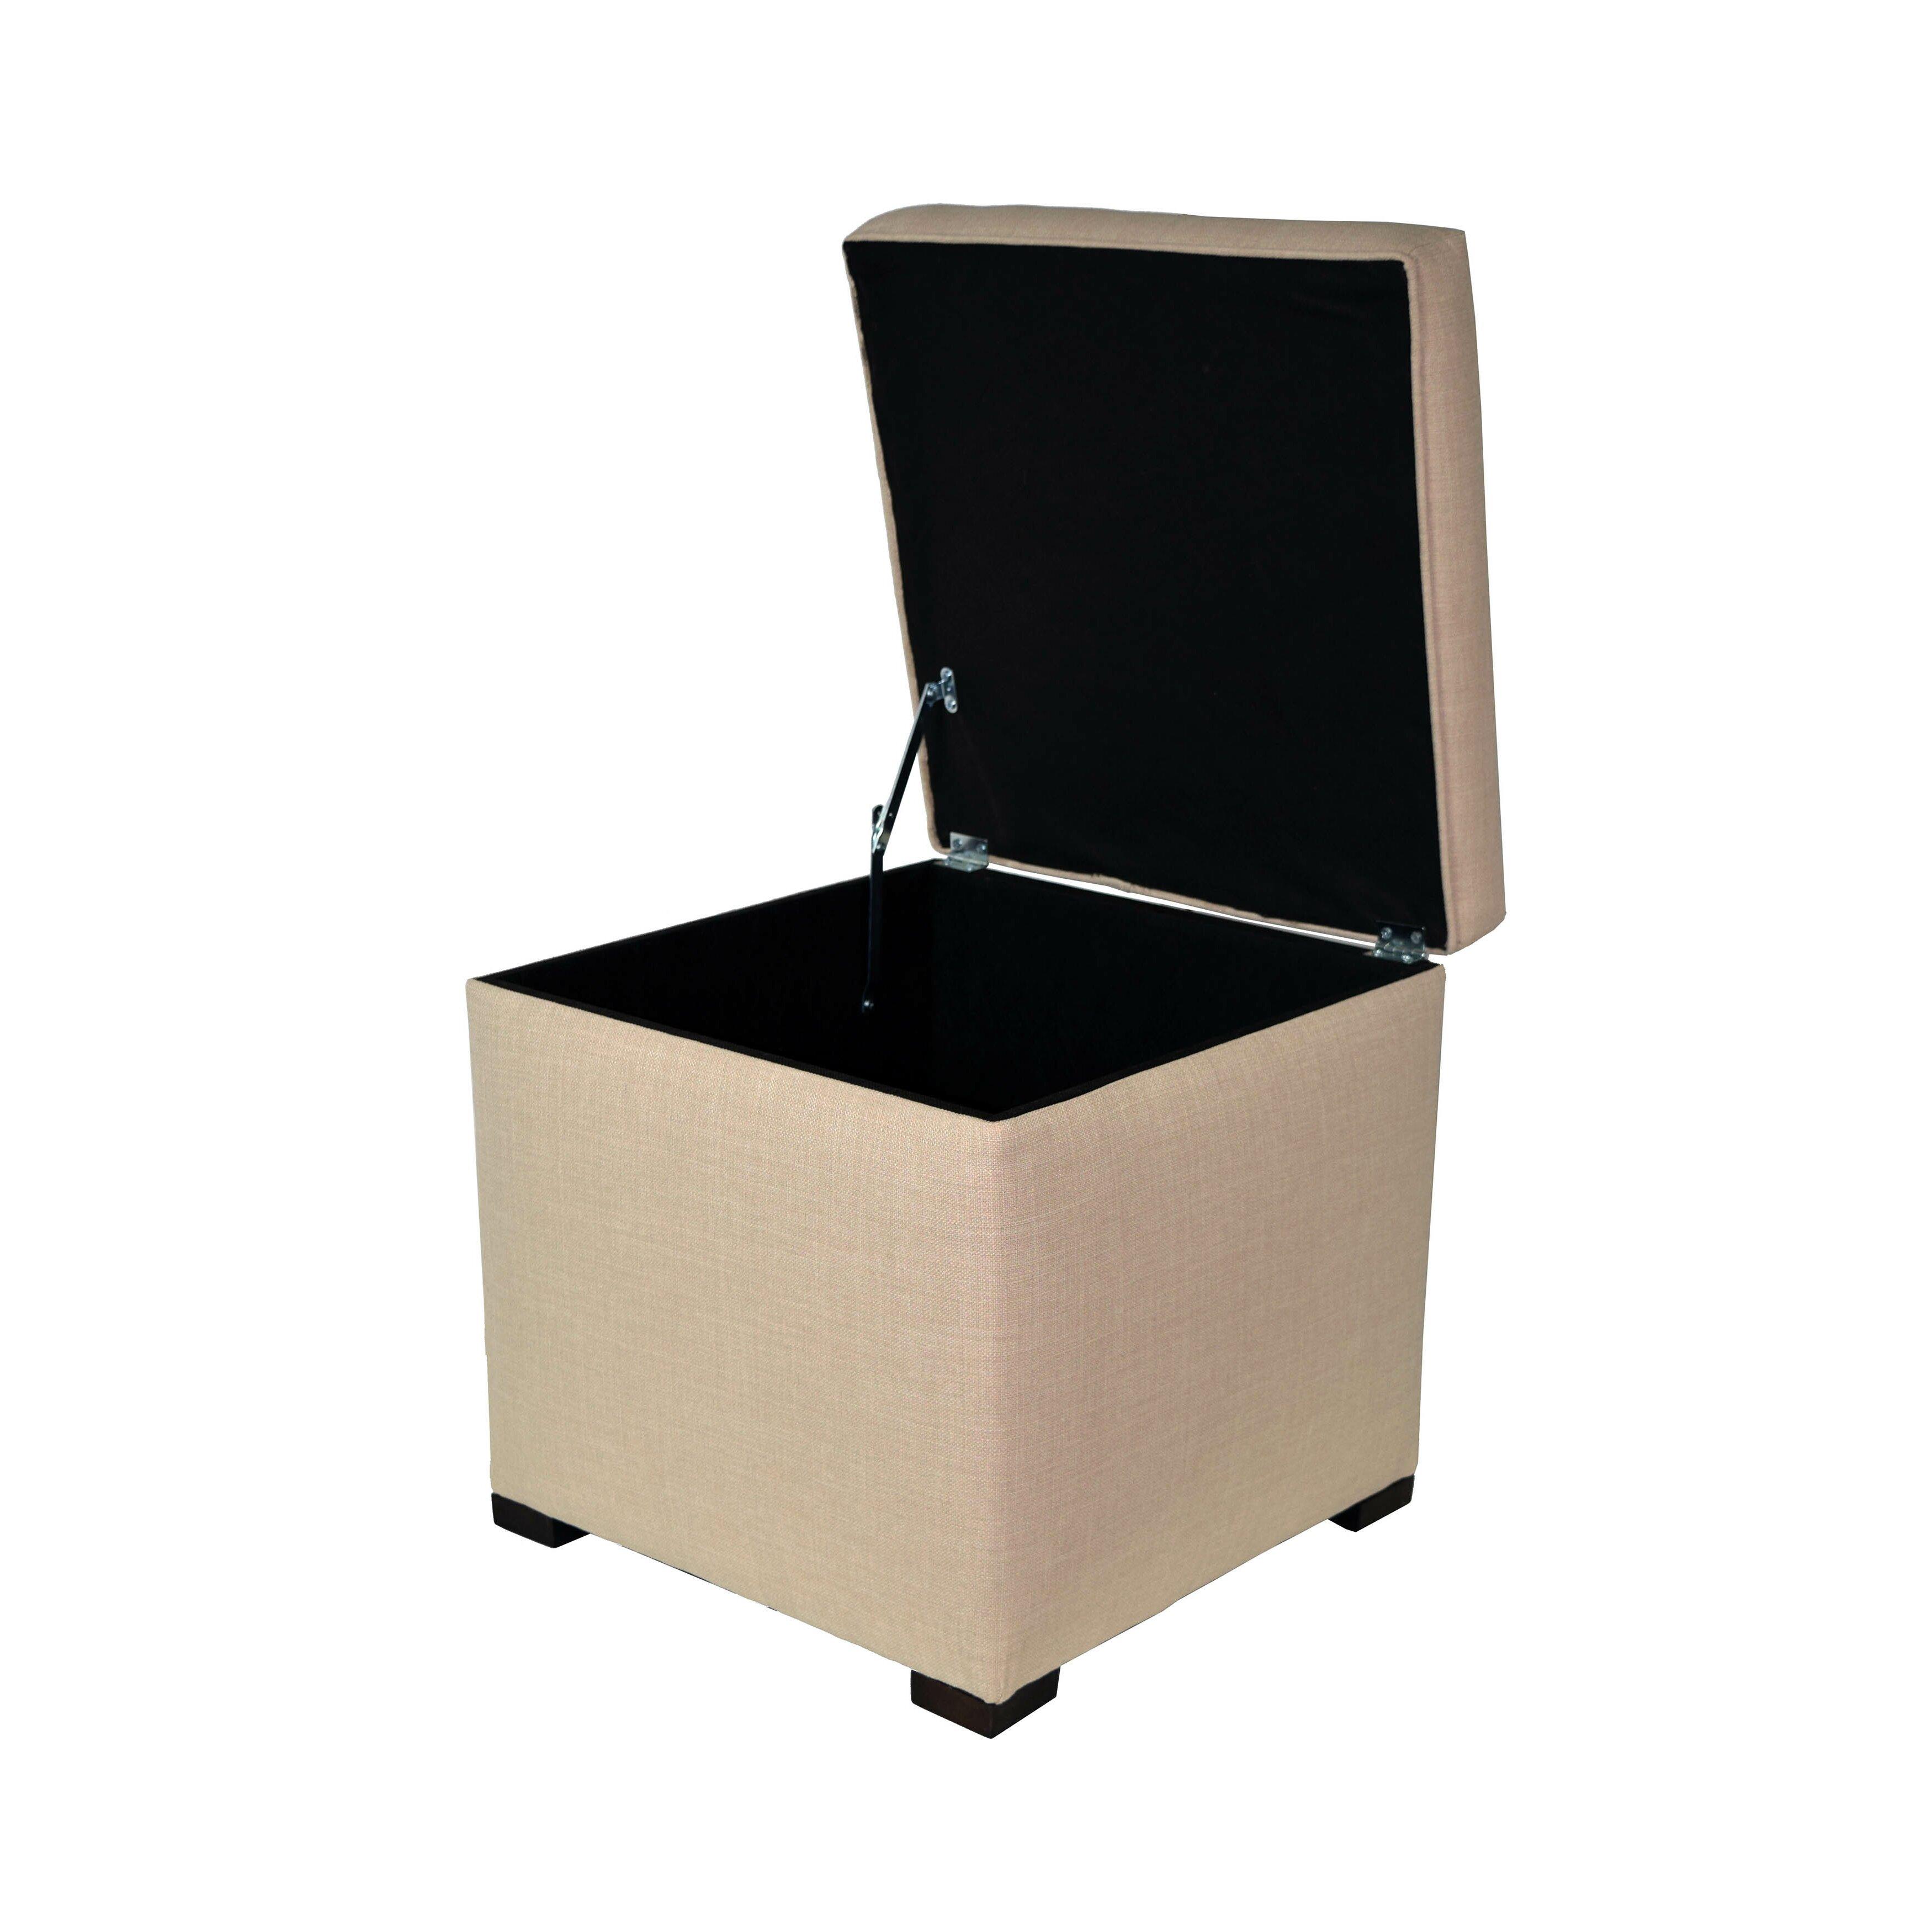 Mjlfurniture tami upholstered storage ottoman reviews for Furniture ottoman storage